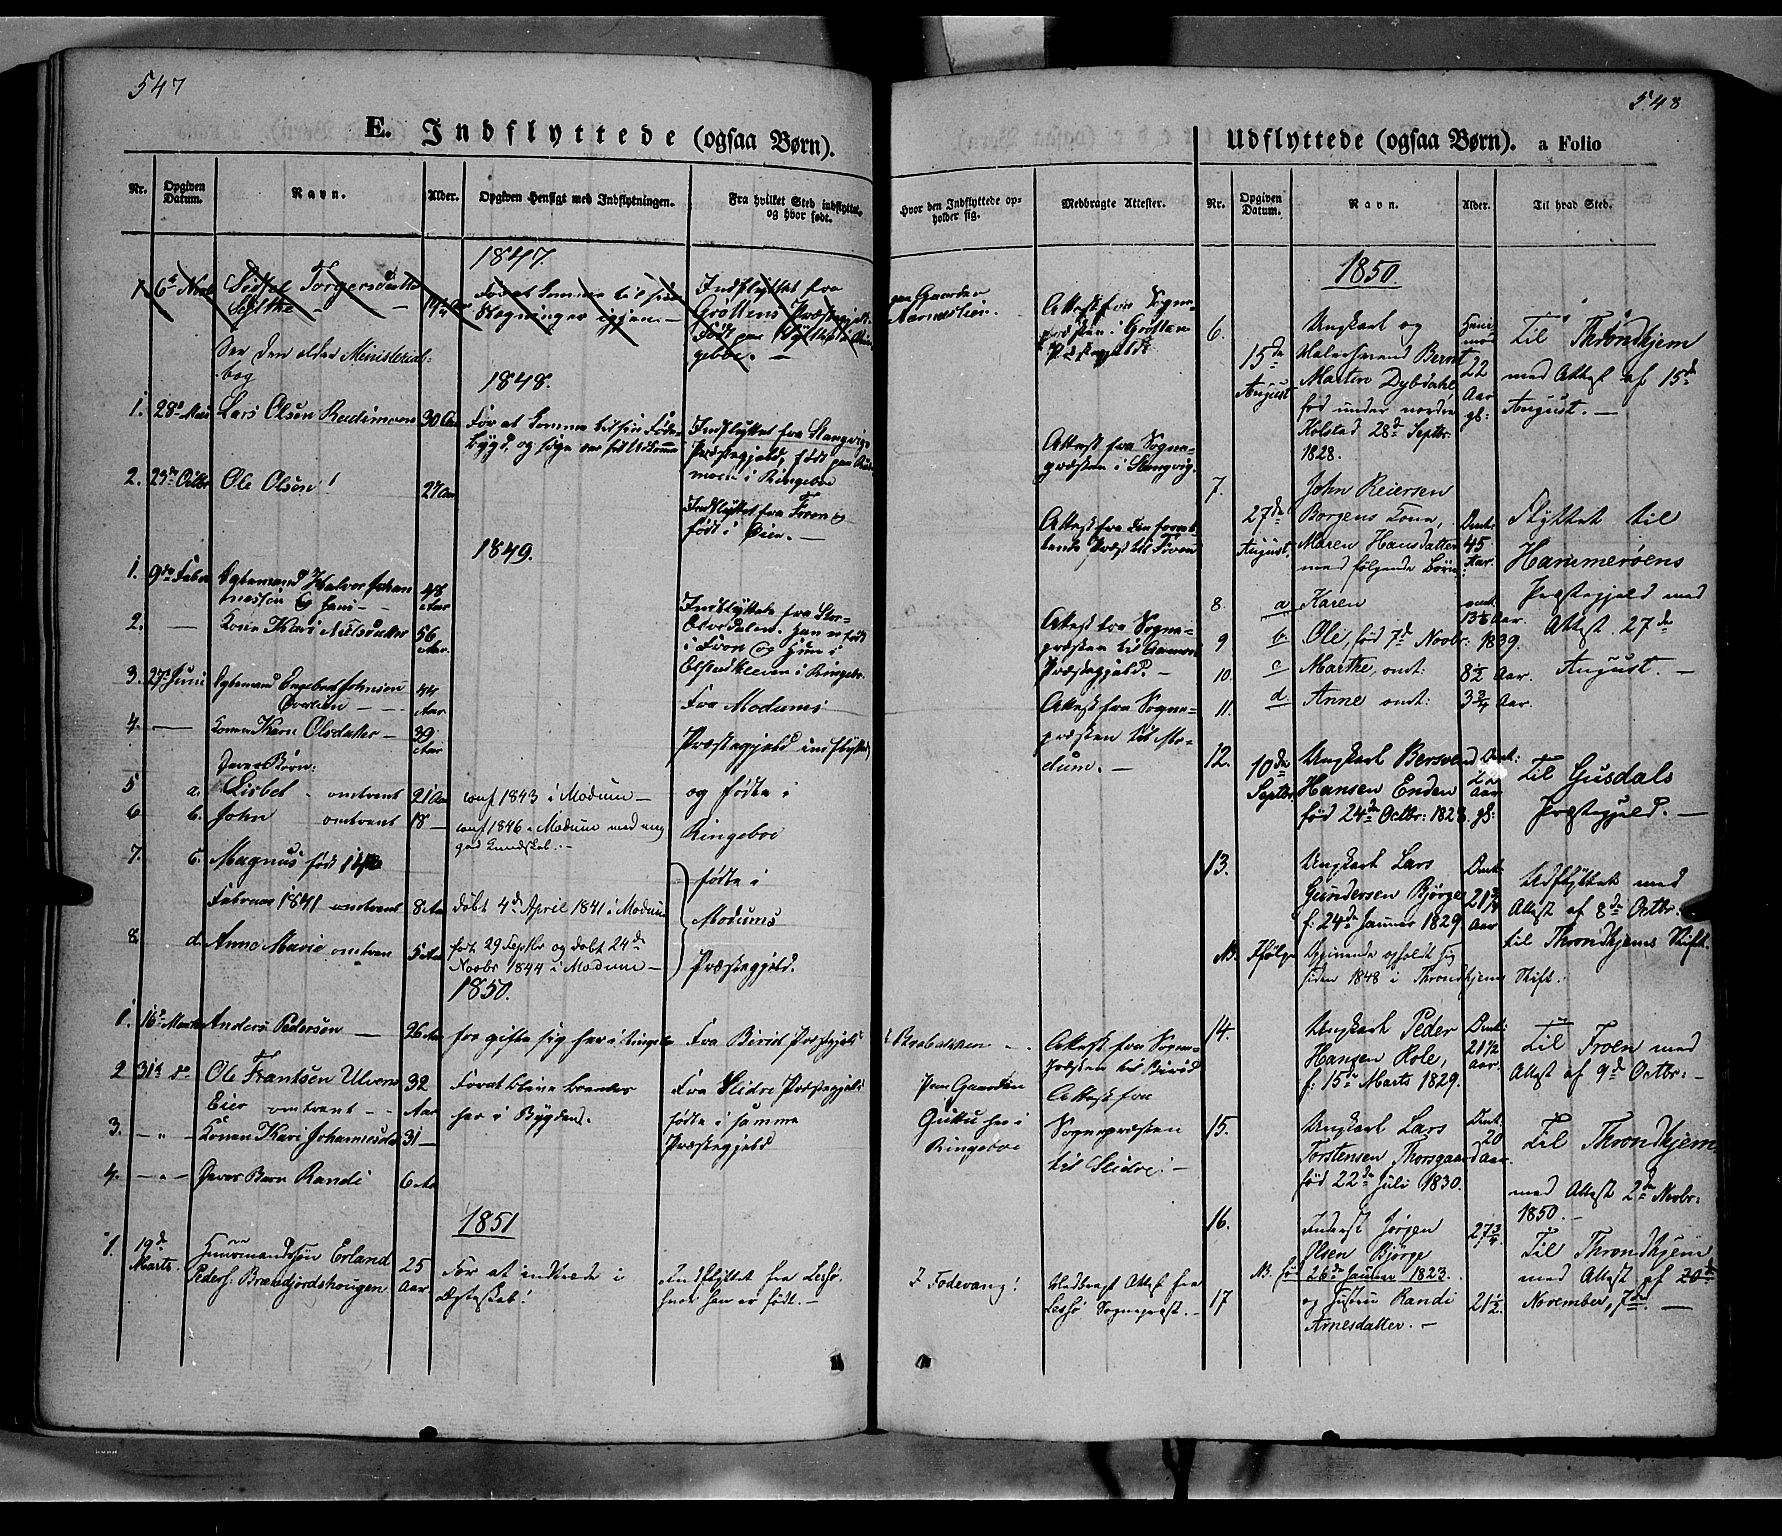 SAH, Ringebu prestekontor, Ministerialbok nr. 6, 1848-1859, s. 547-548